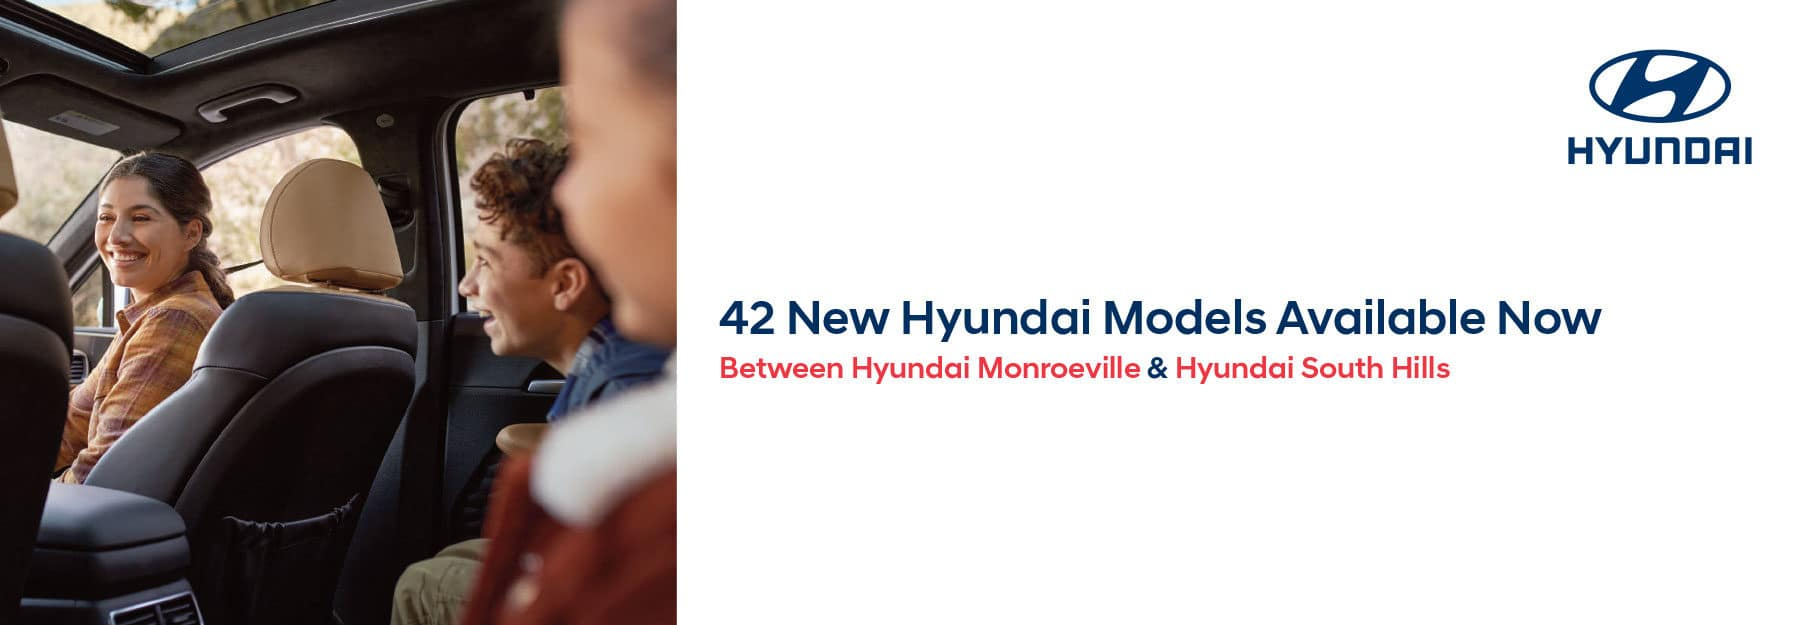 2021-september-hyundai-new-models-1